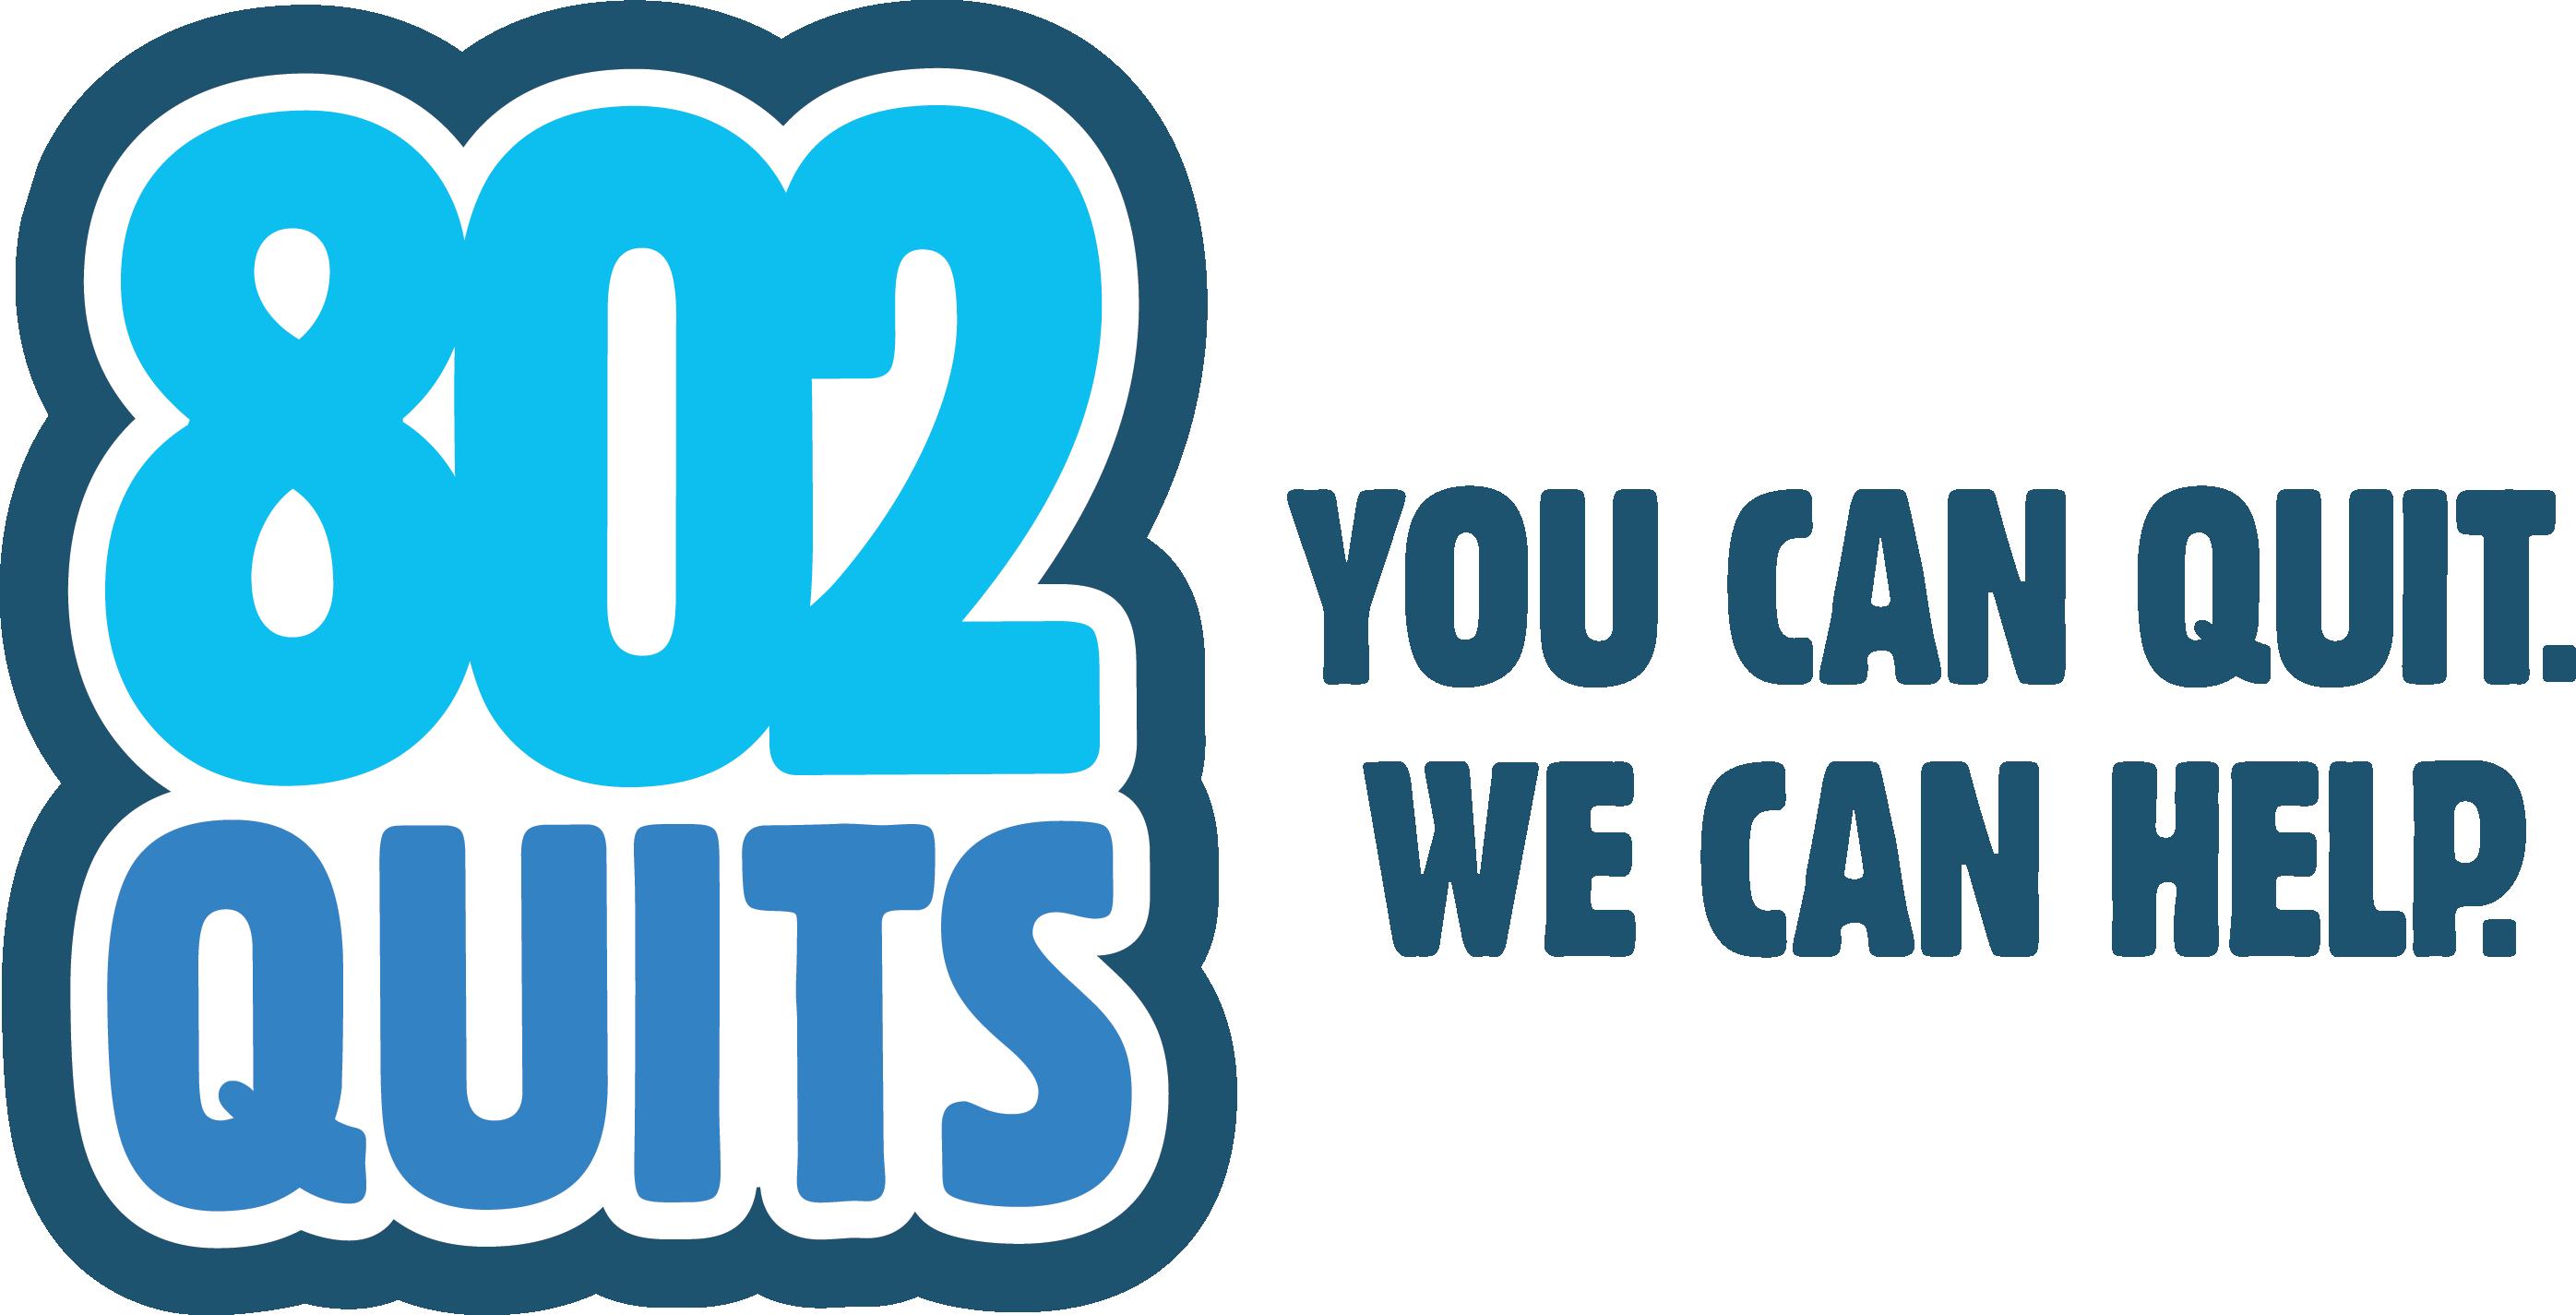 شعار 802Quits